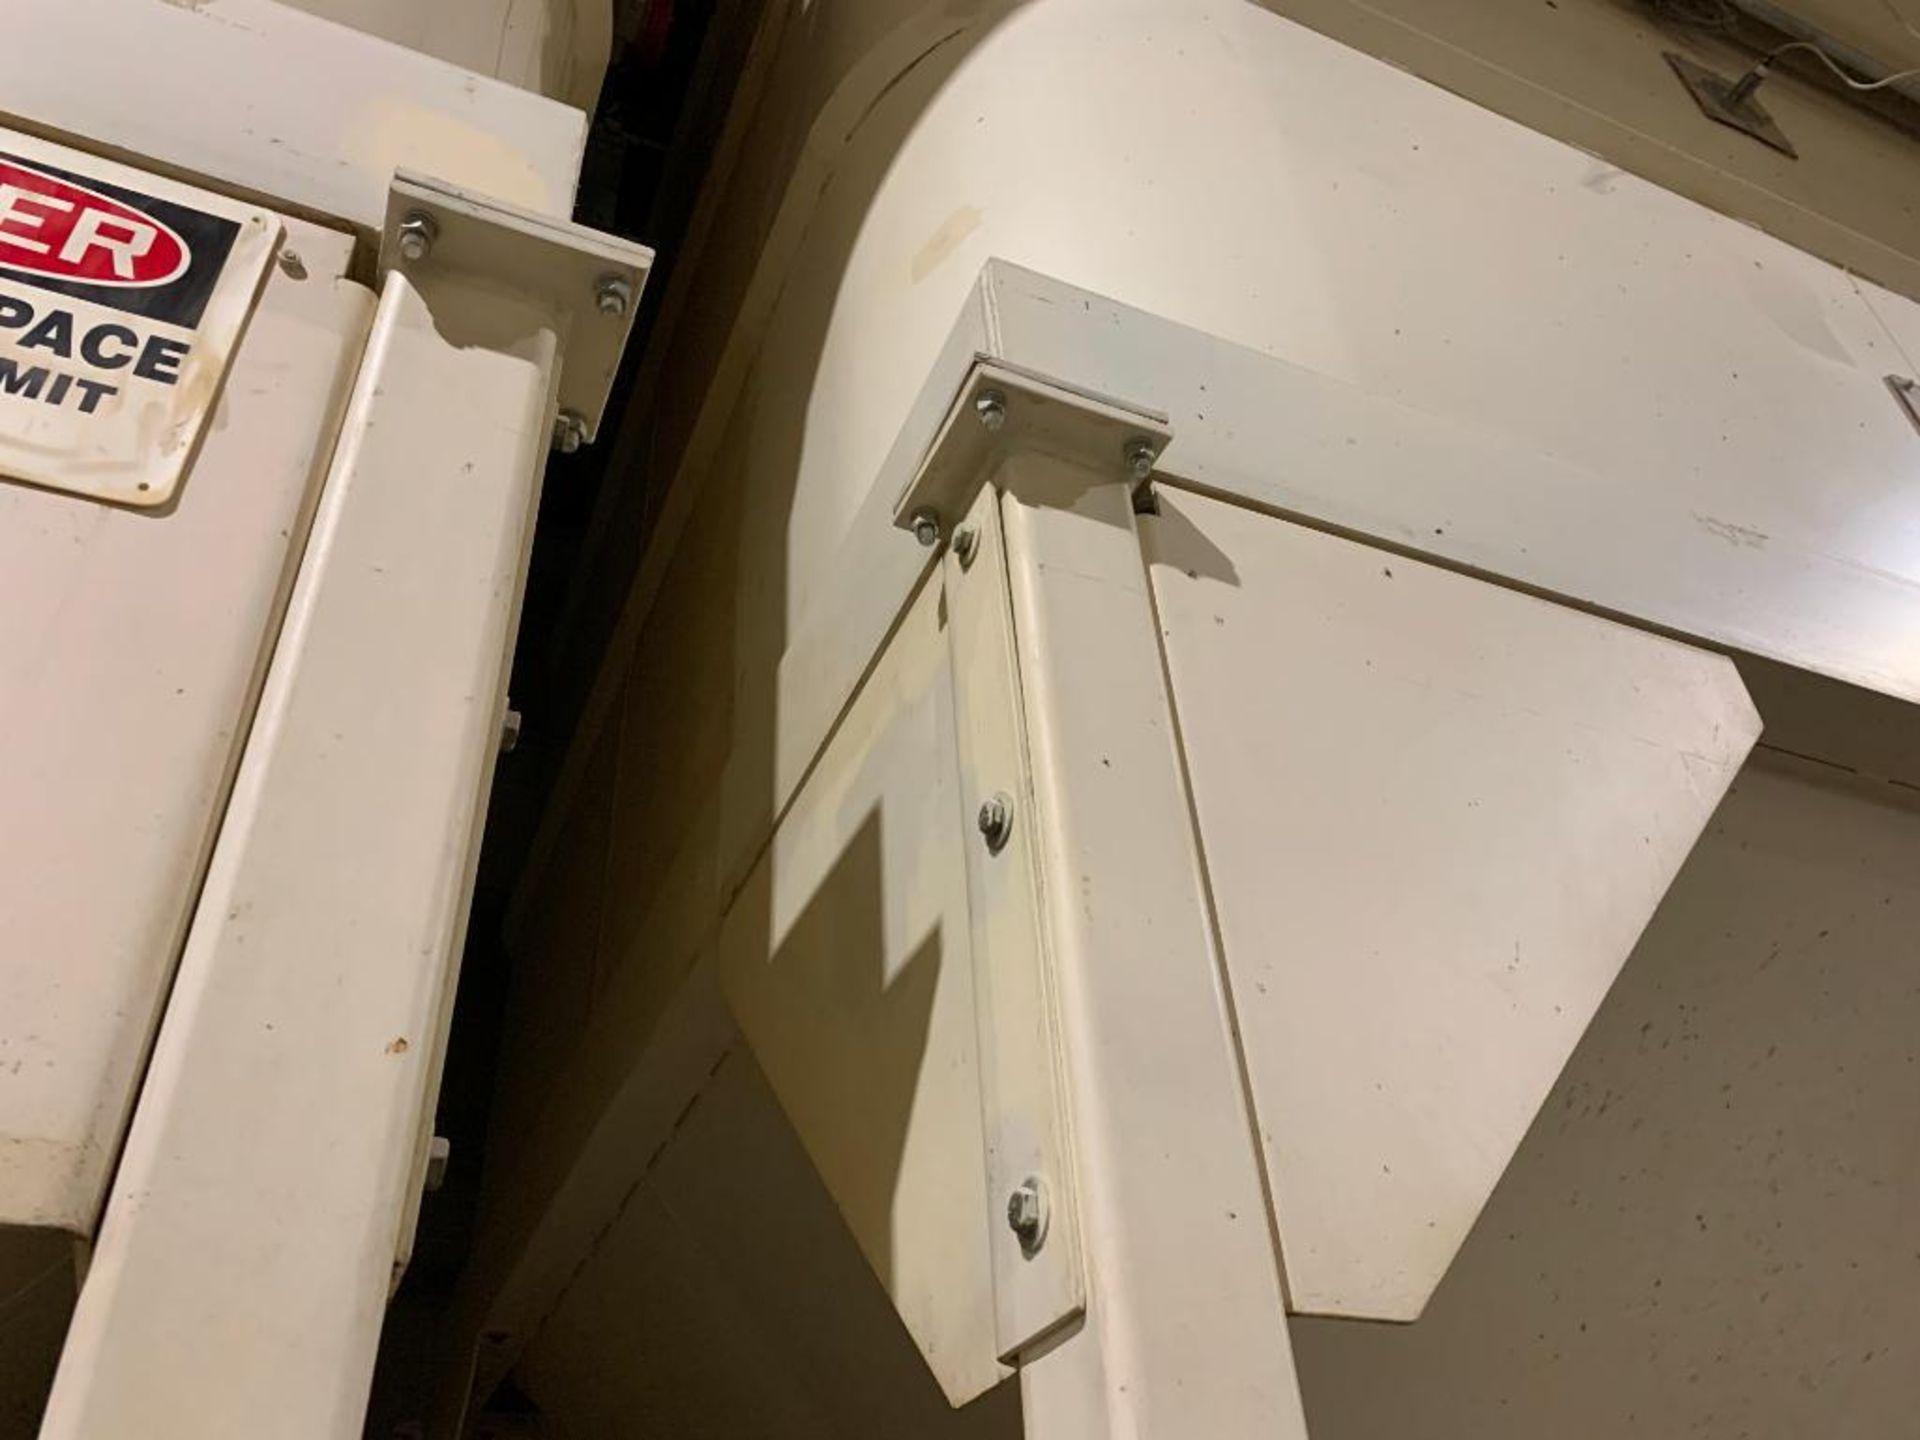 Aseeco mild steel cone bottom bulk storage bin - Image 14 of 25